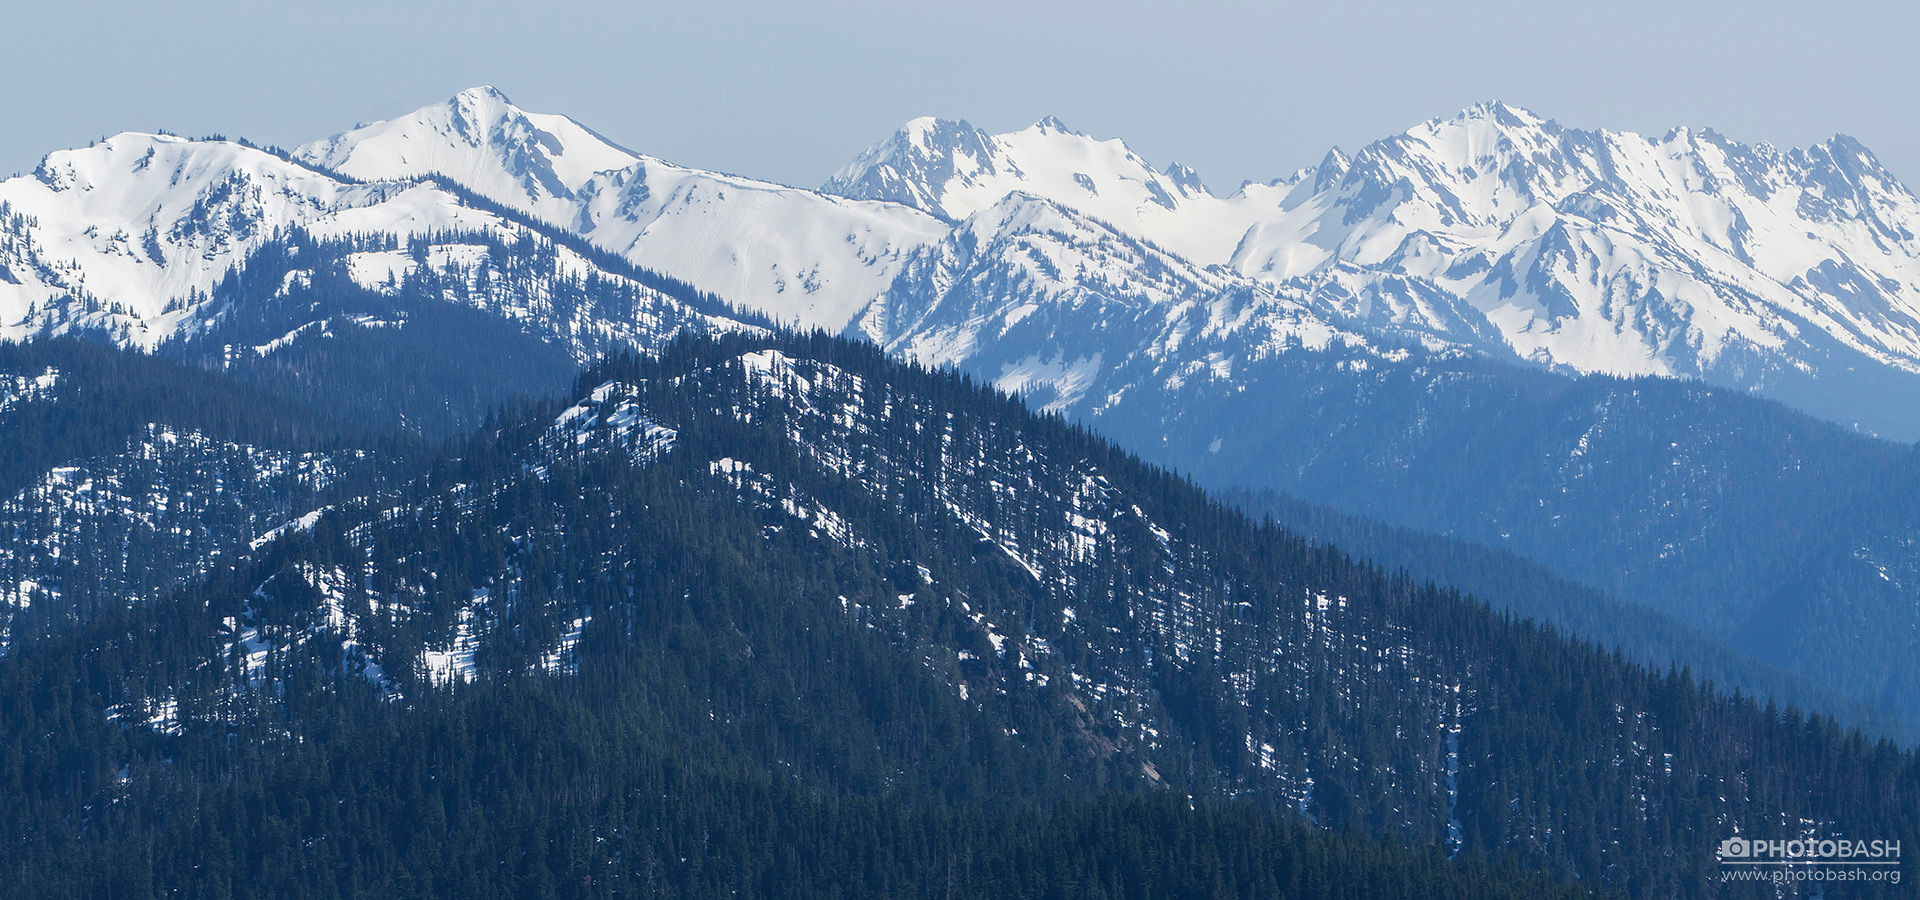 Pinewood-Mountains-Snow-Alpine-Peaks.jpg